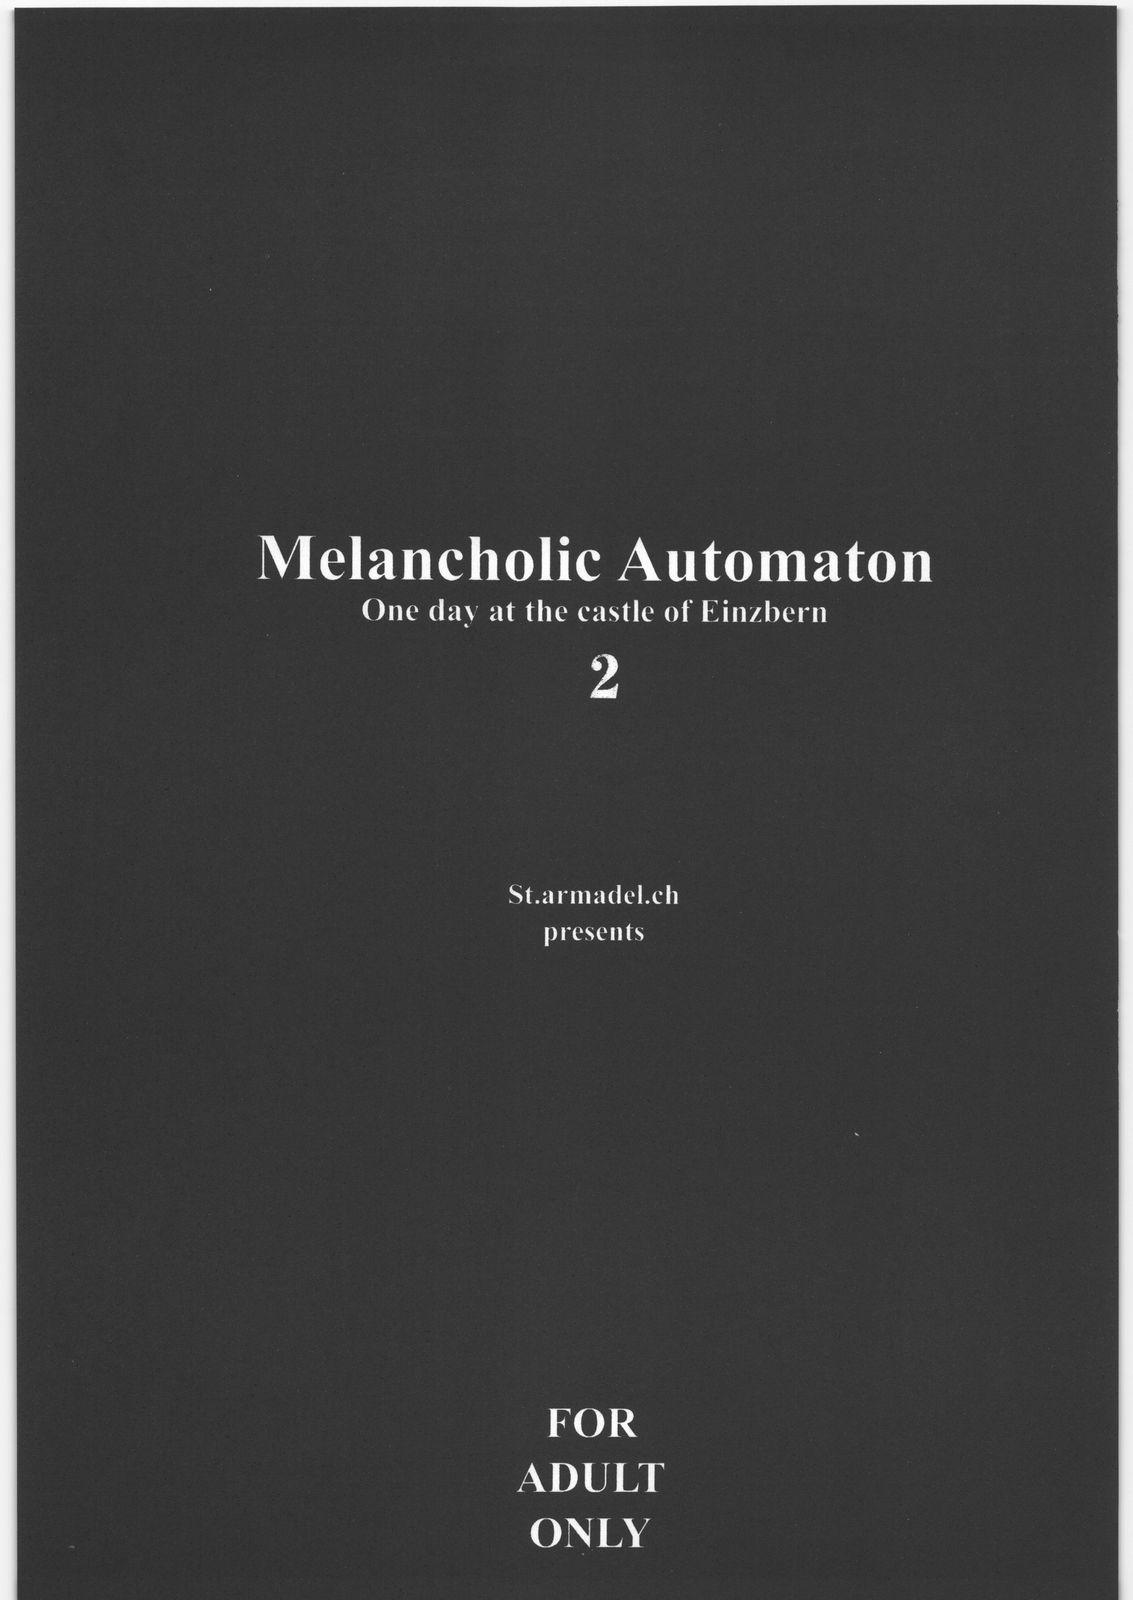 Melancholic Automaton 2 - One day at the castle of Einzbern 1